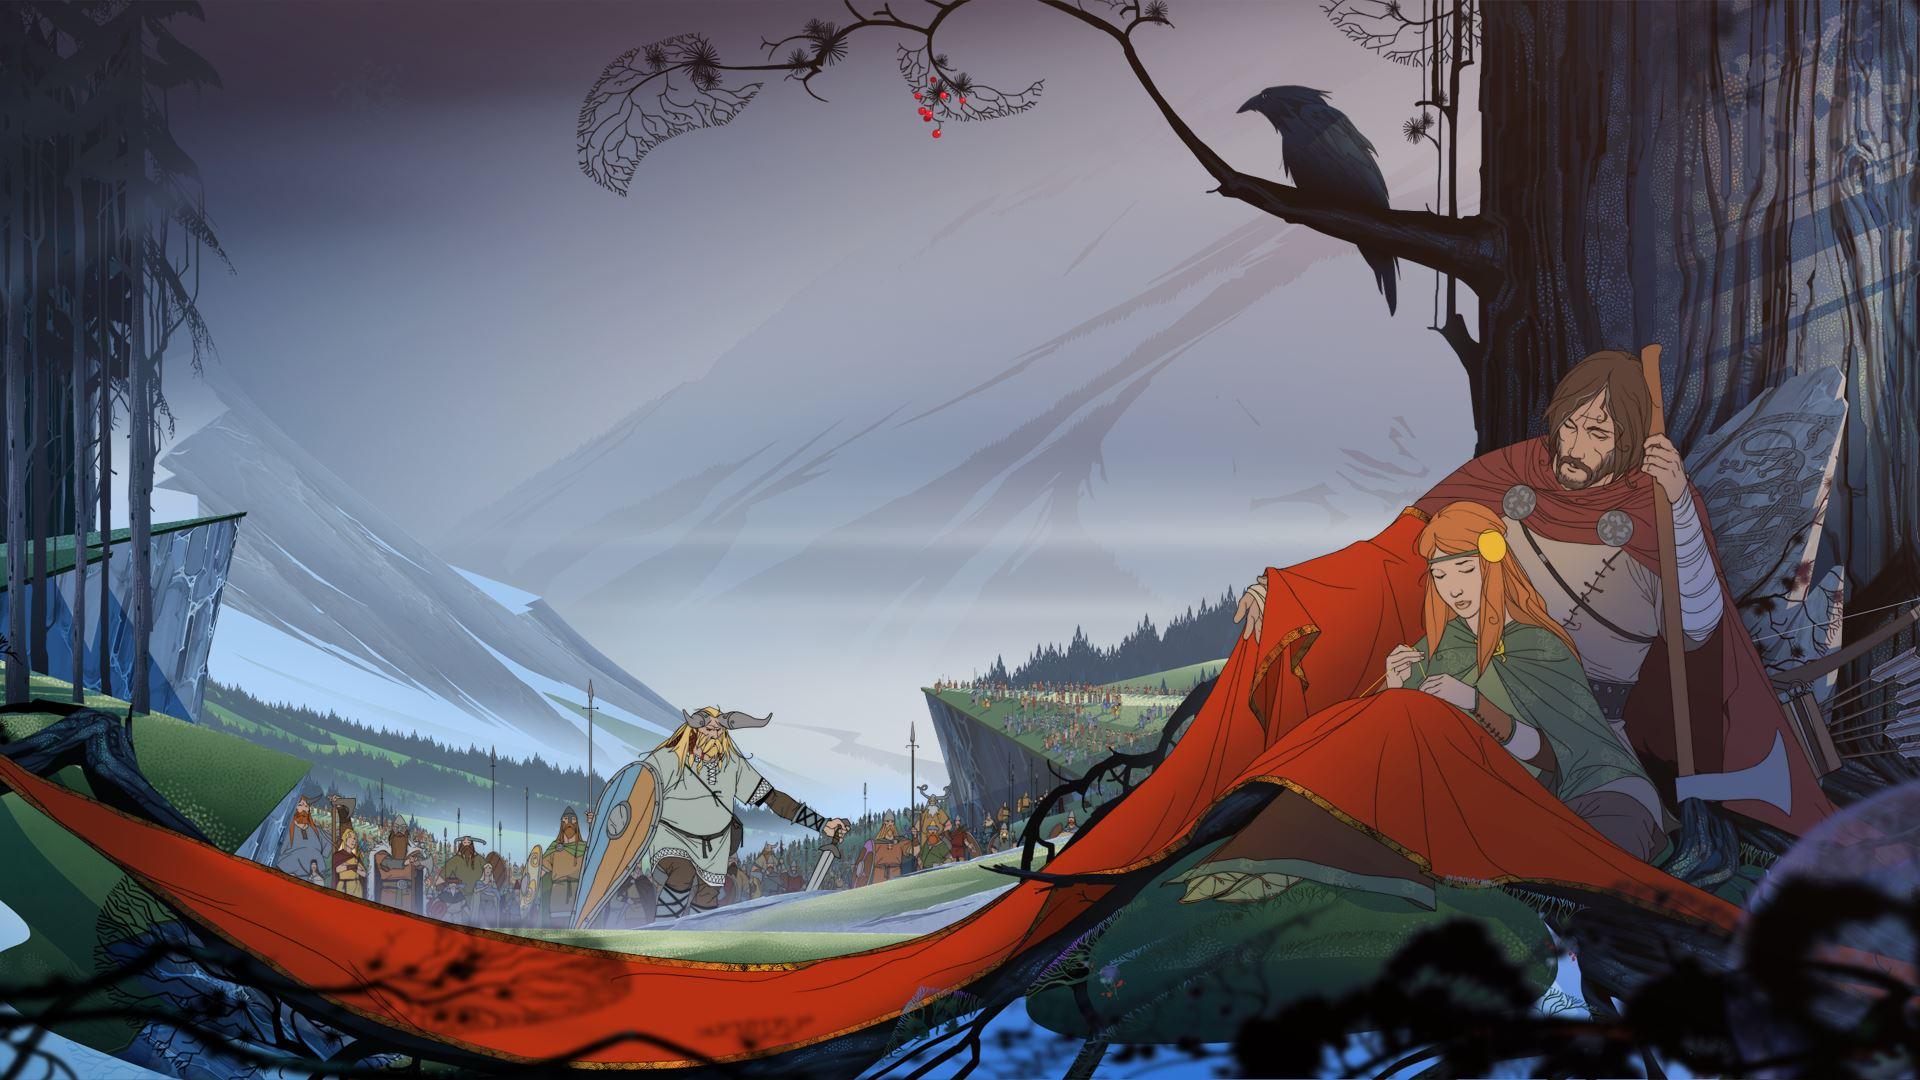 The Banner Saga Wallpaper: Porting The Banner Saga To Consoles Was No Easy Task